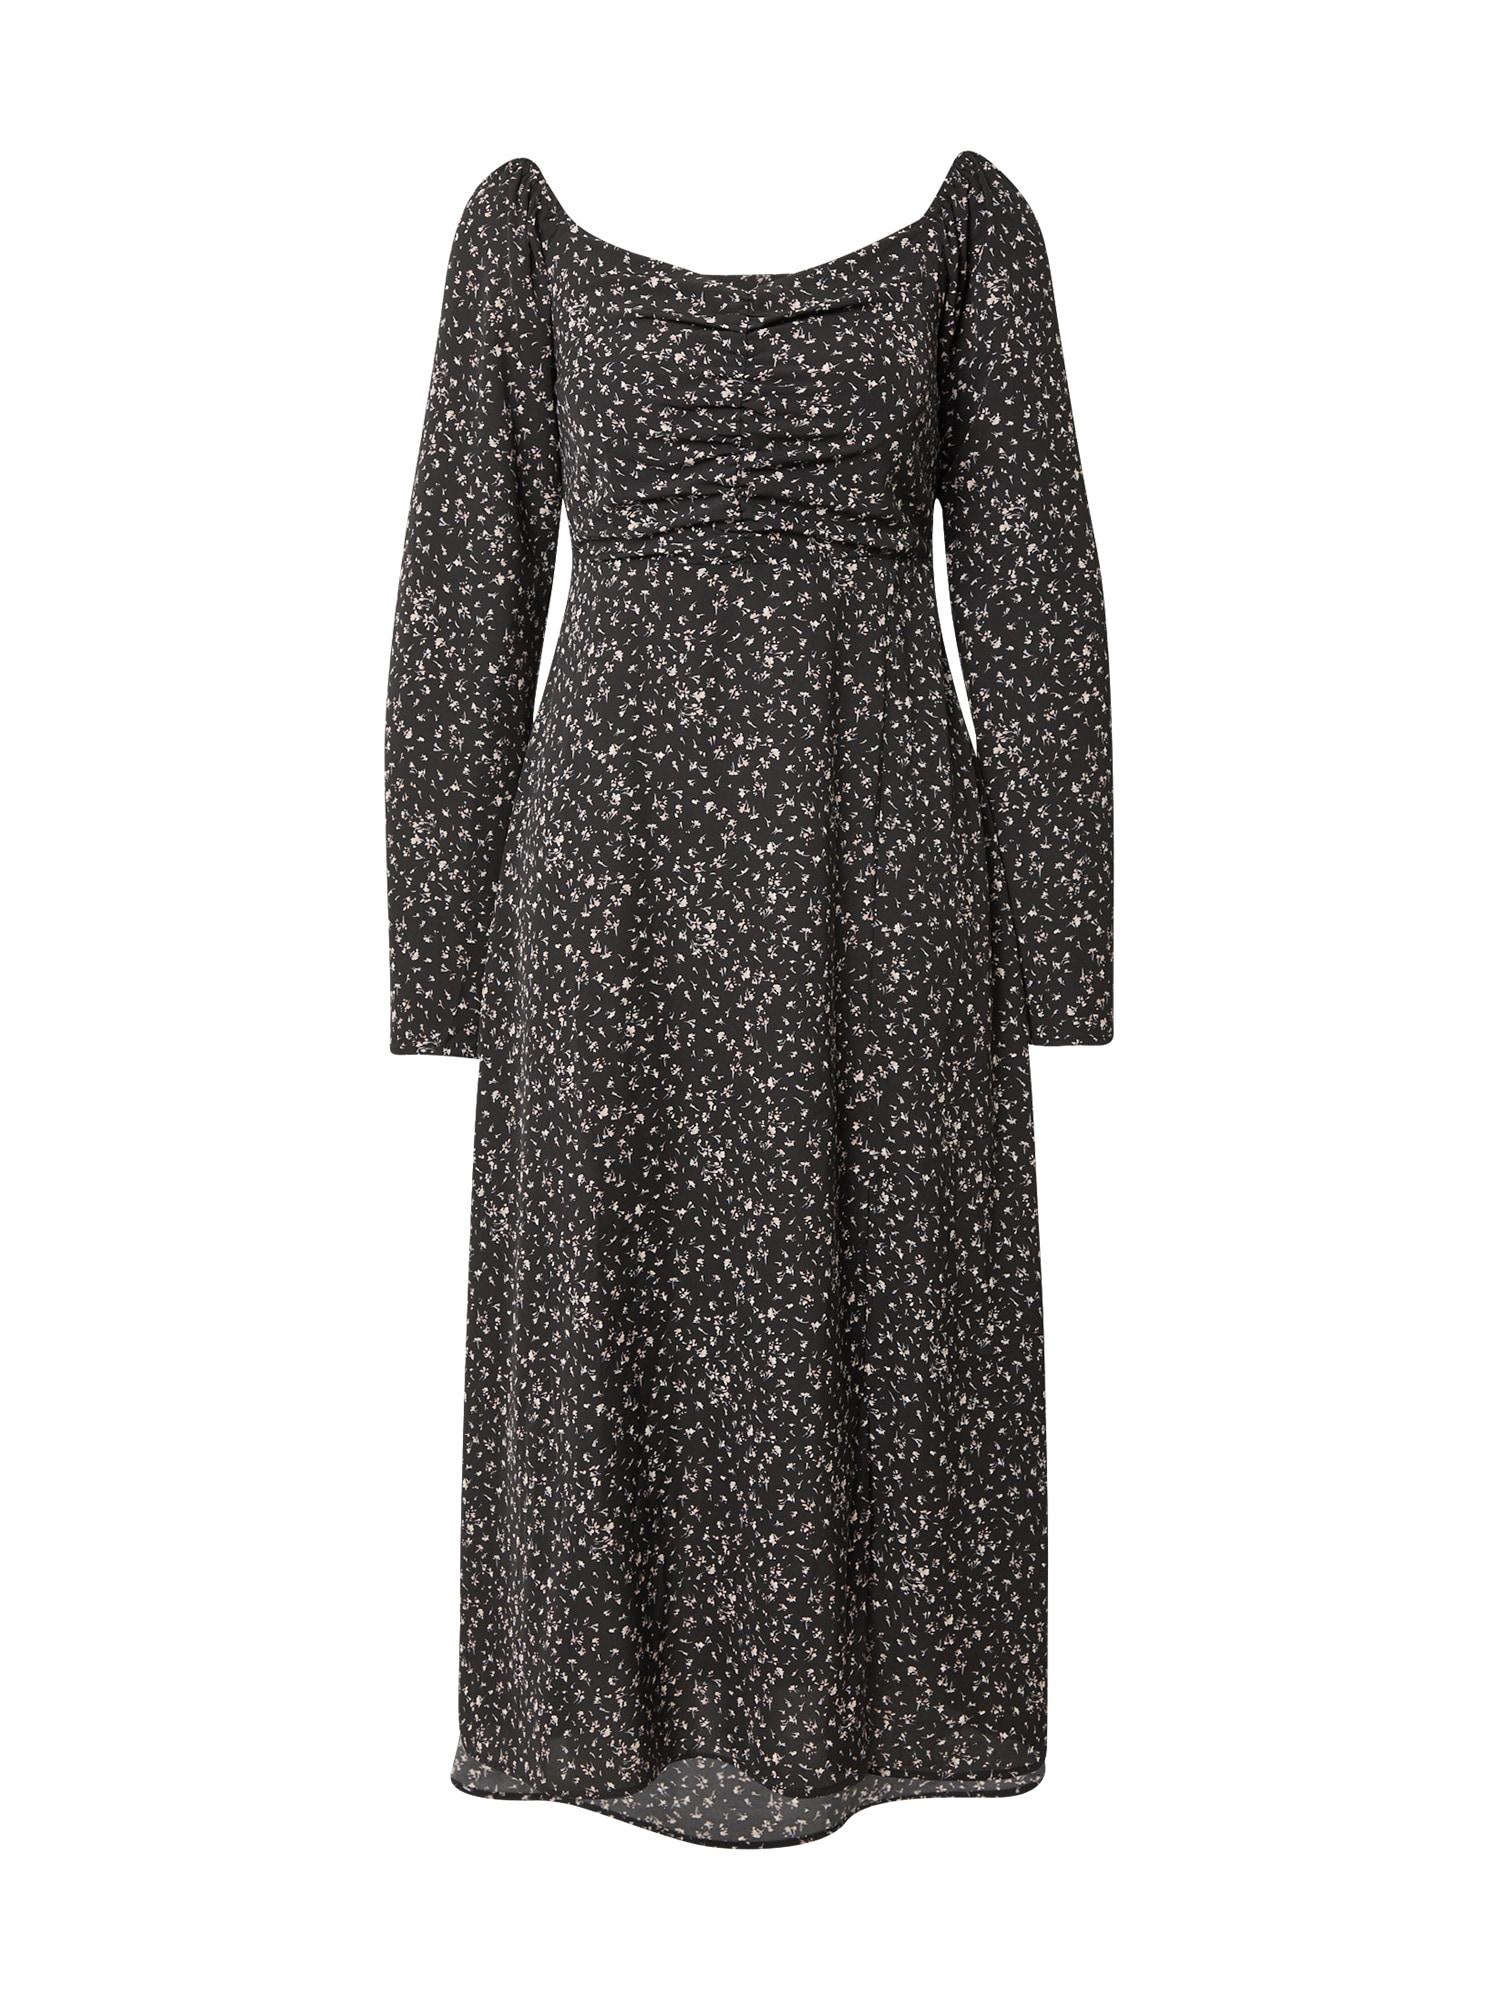 Rut & Circle Šaty 'CAROLINA'  černá / bílá